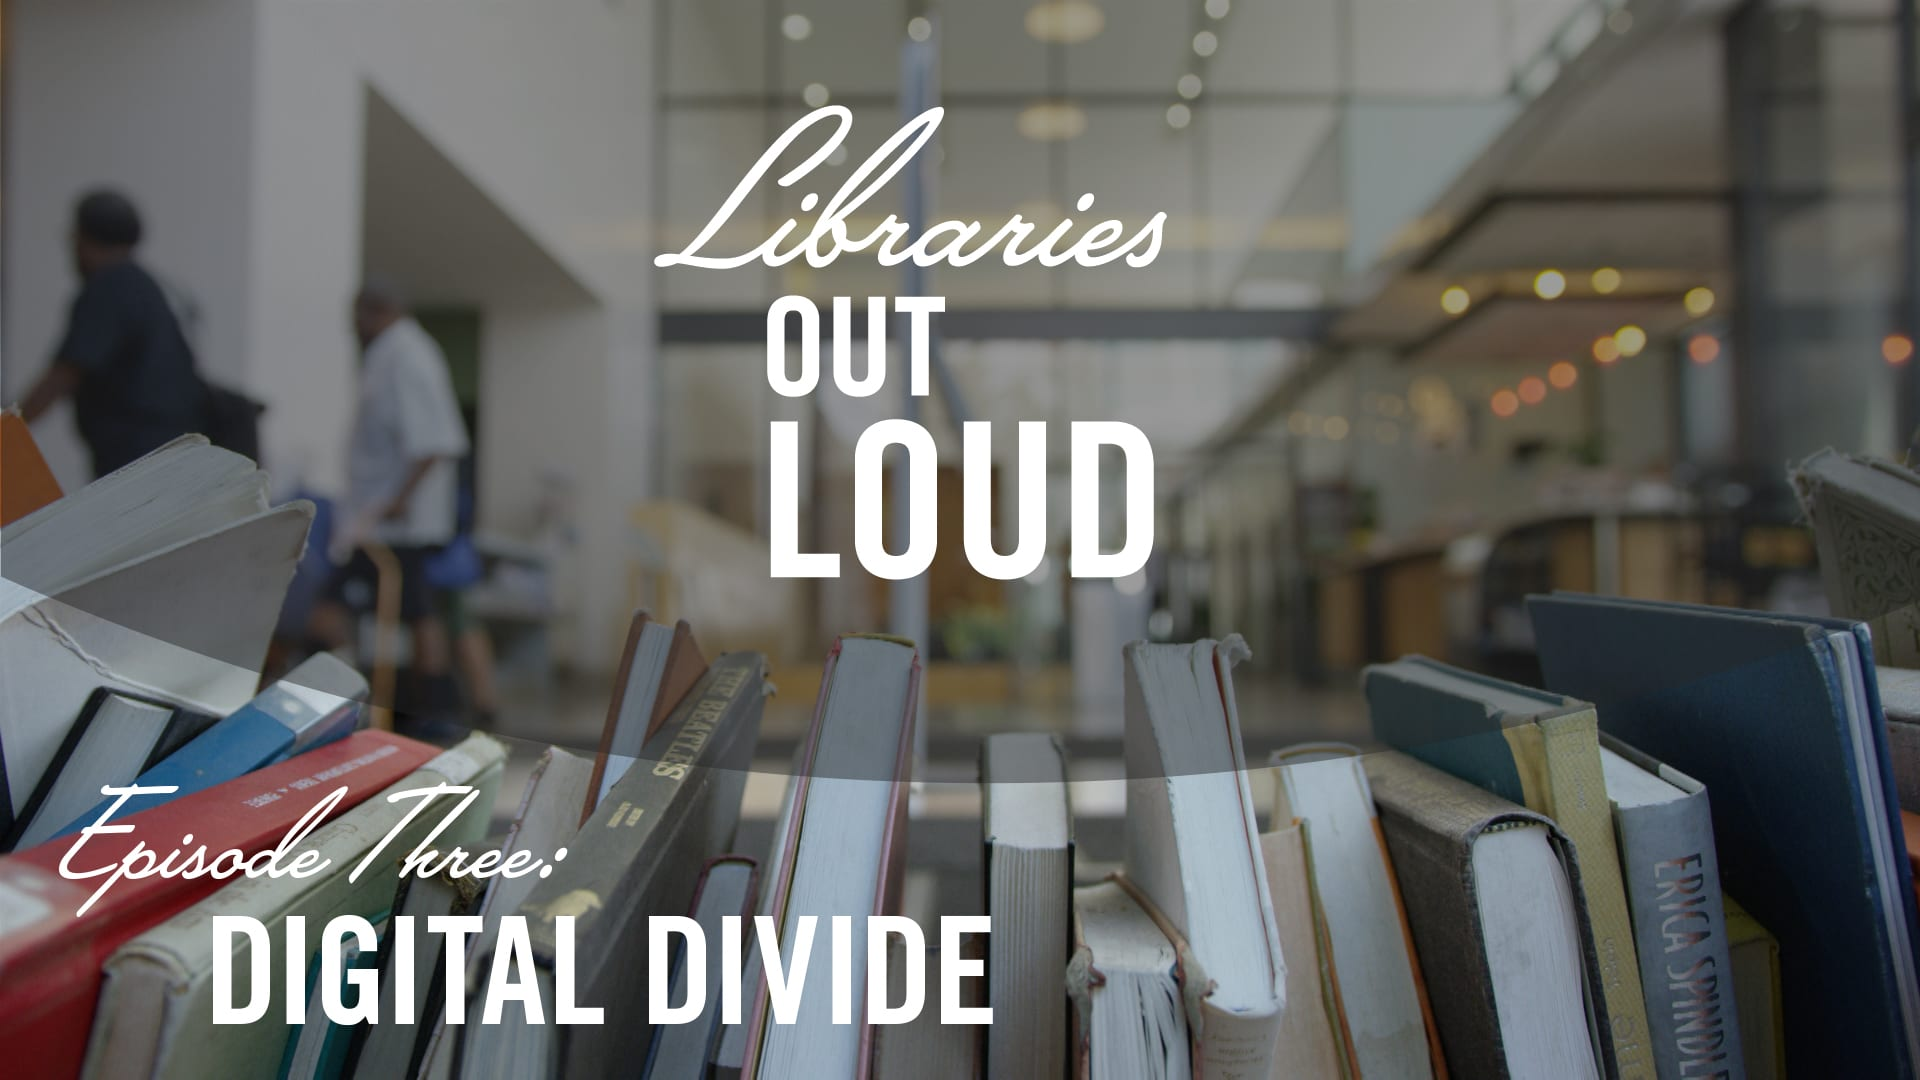 Libraries Out Loud Episode 3 | Digital Divide